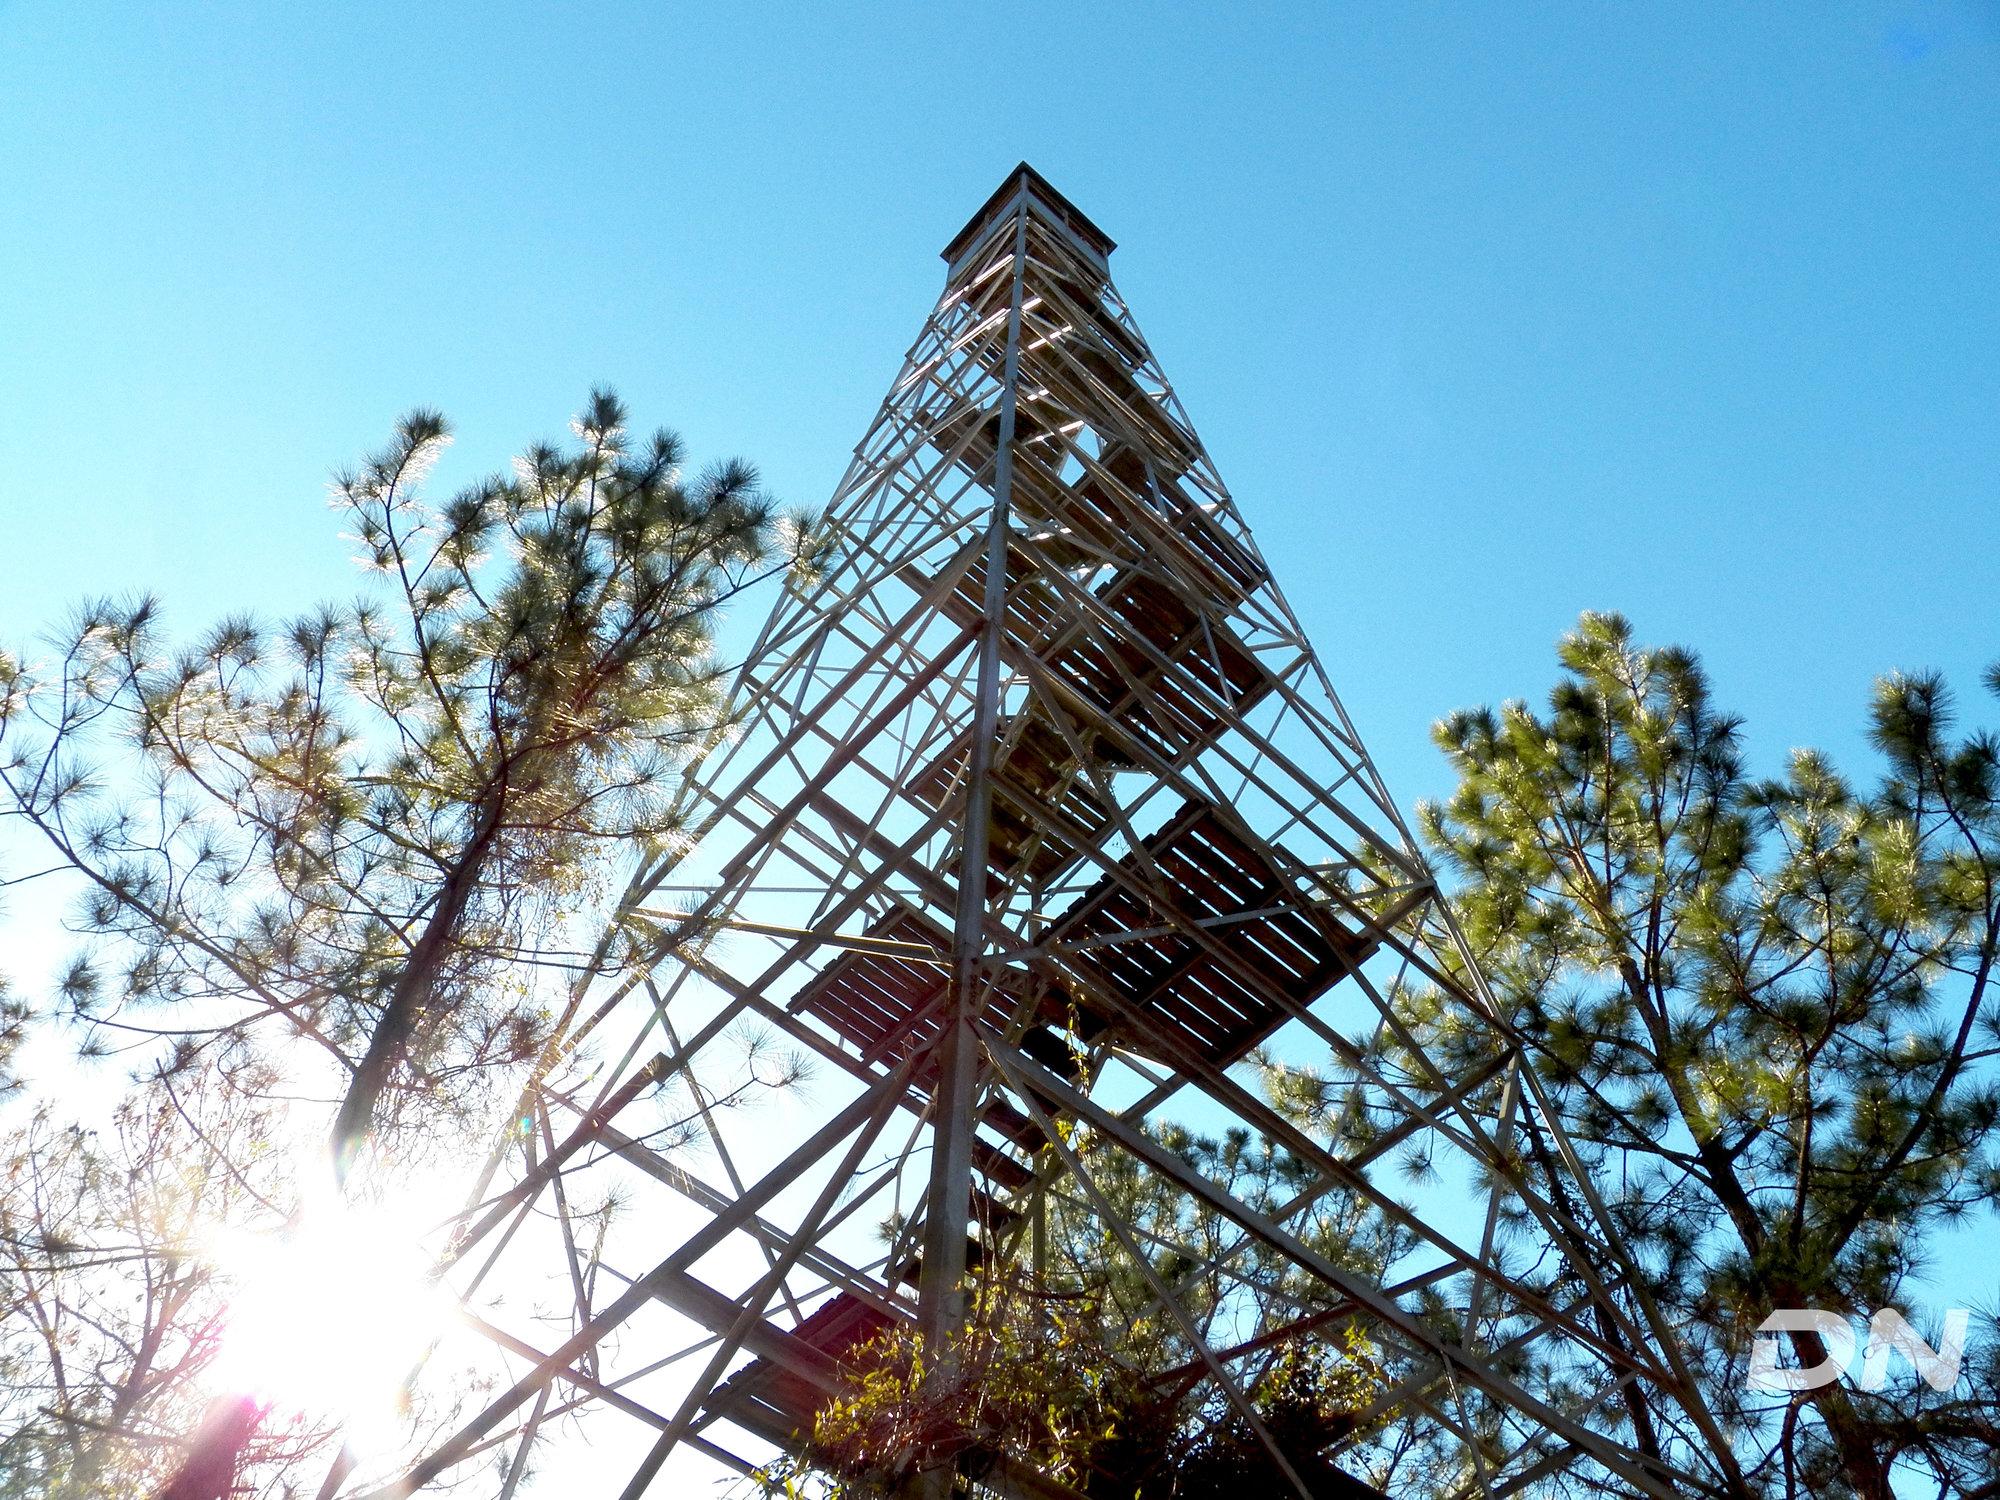 Fire Tower Cordele.jpg